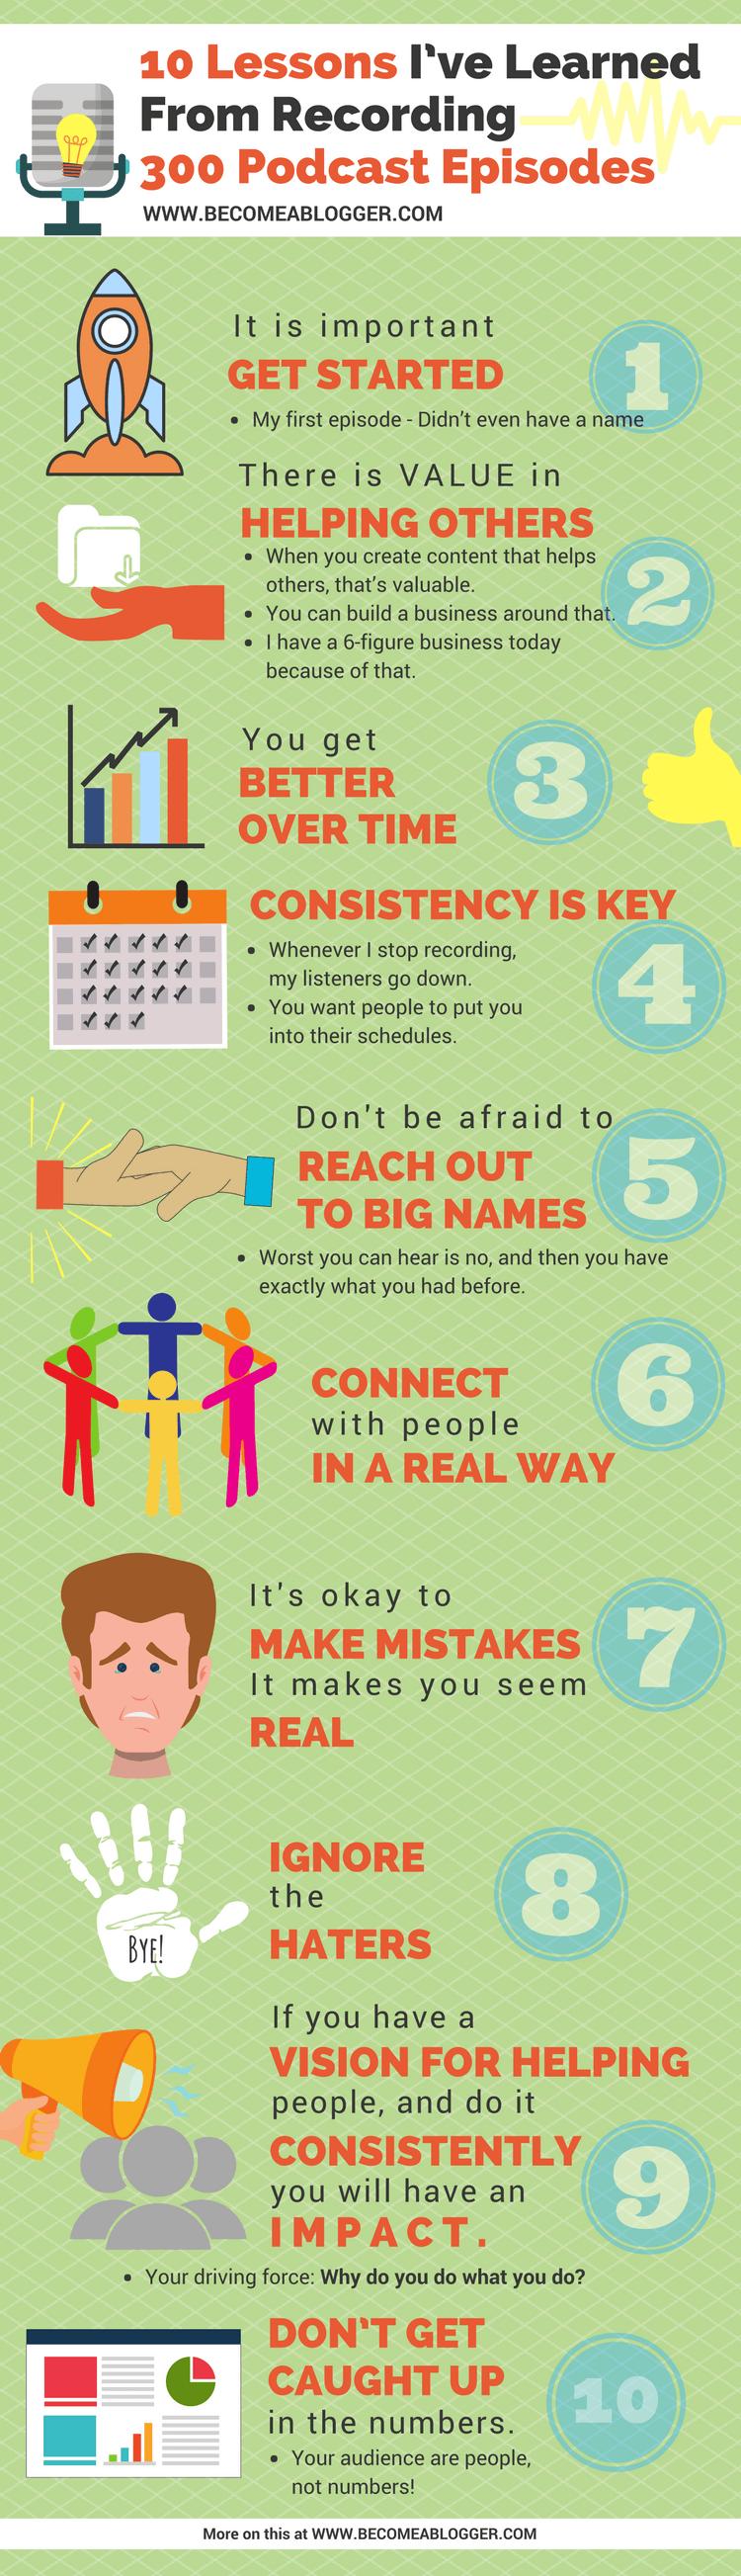 10 Lessons I've Learned